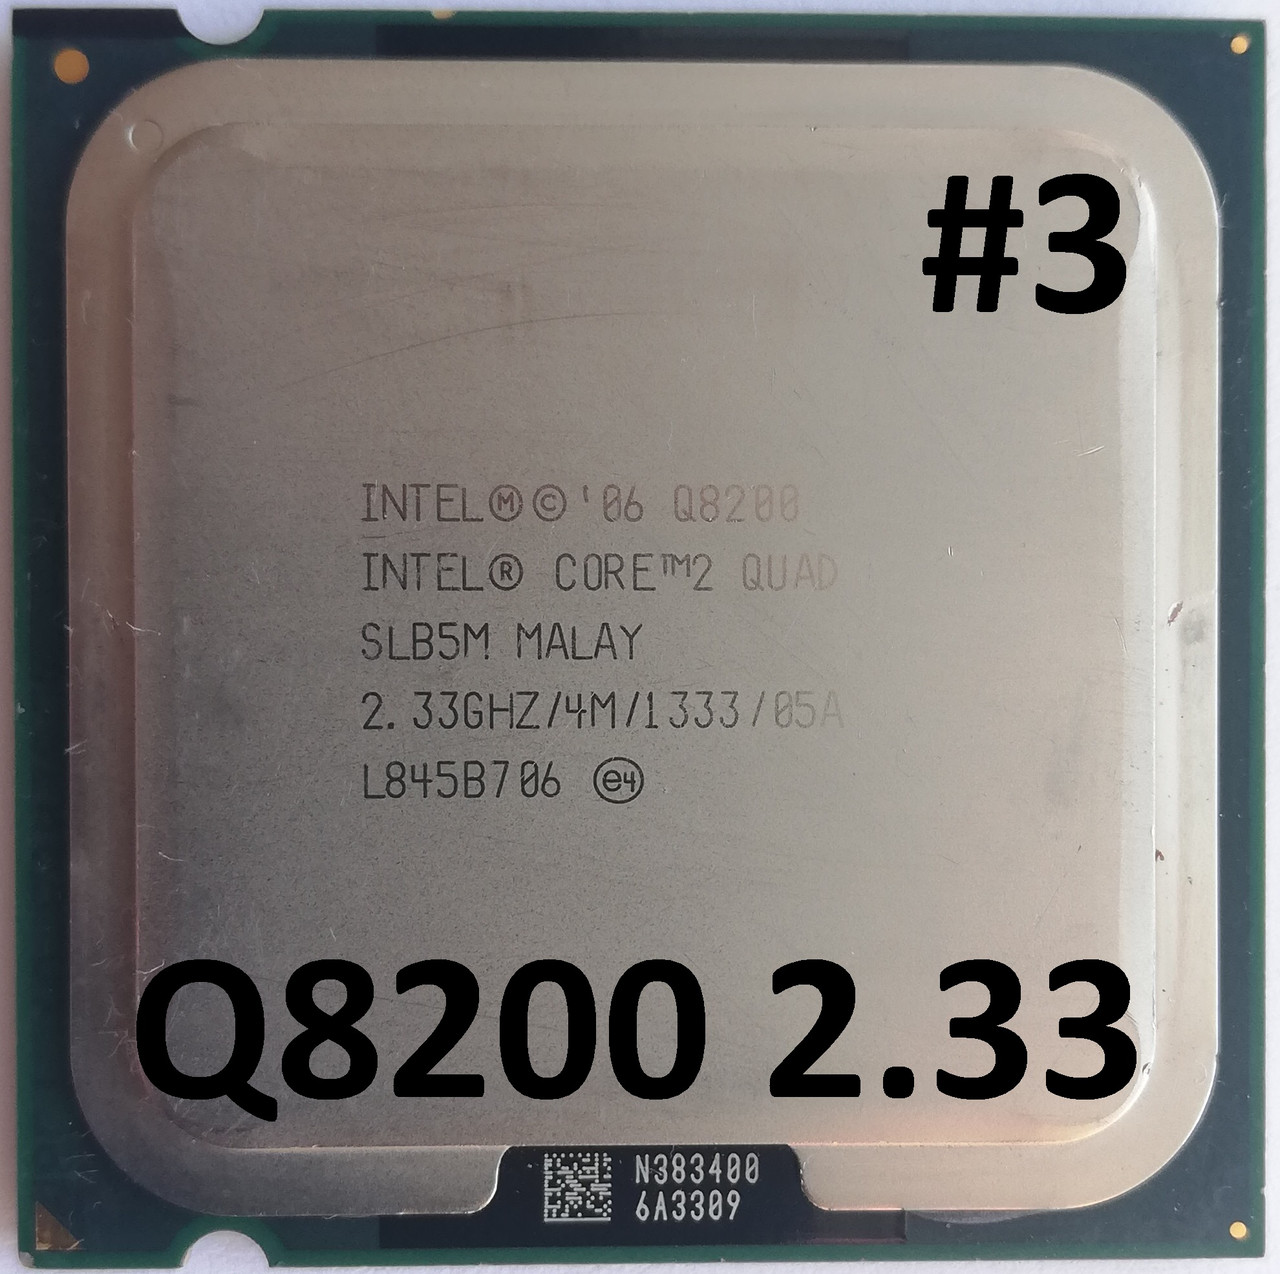 Процессор ЛОТ#3 Intel® Core™2 Quad Q8200 M1 SLB5M 2.33GHz 4M Cache 1333 MHz FSB Soket 775 Б/У